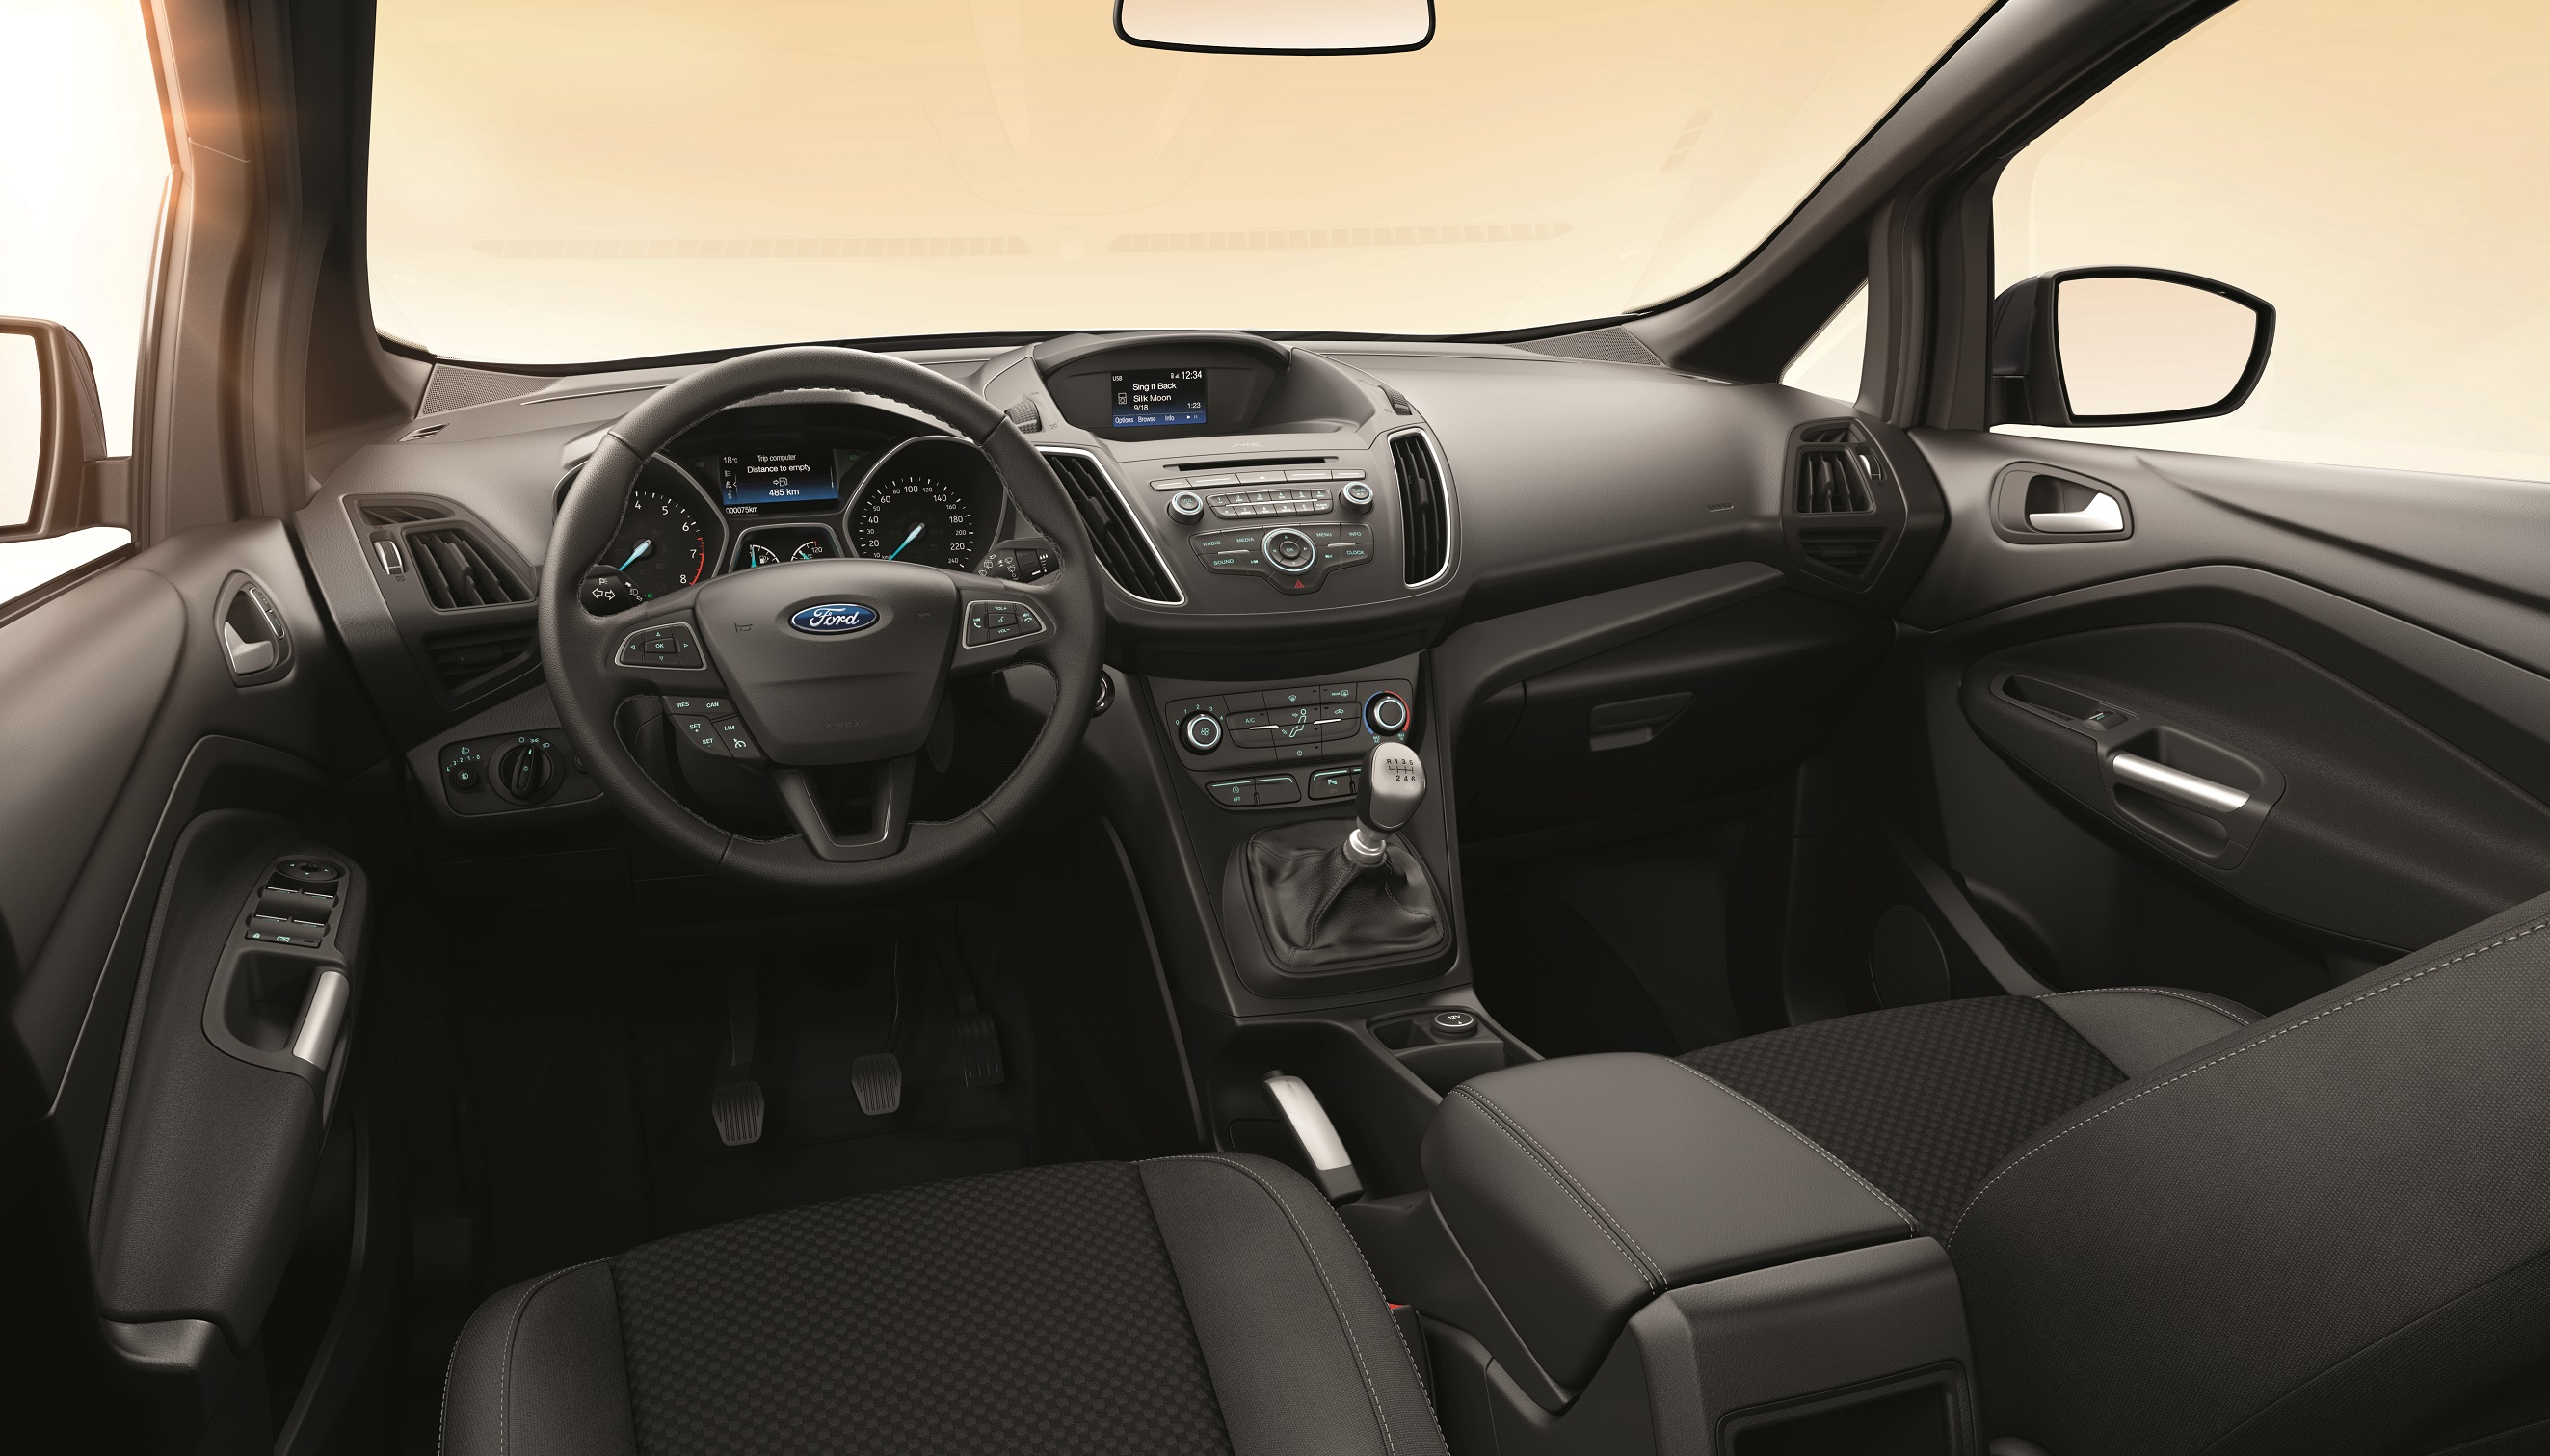 Ford C-Max nun mit sportlichem Styling